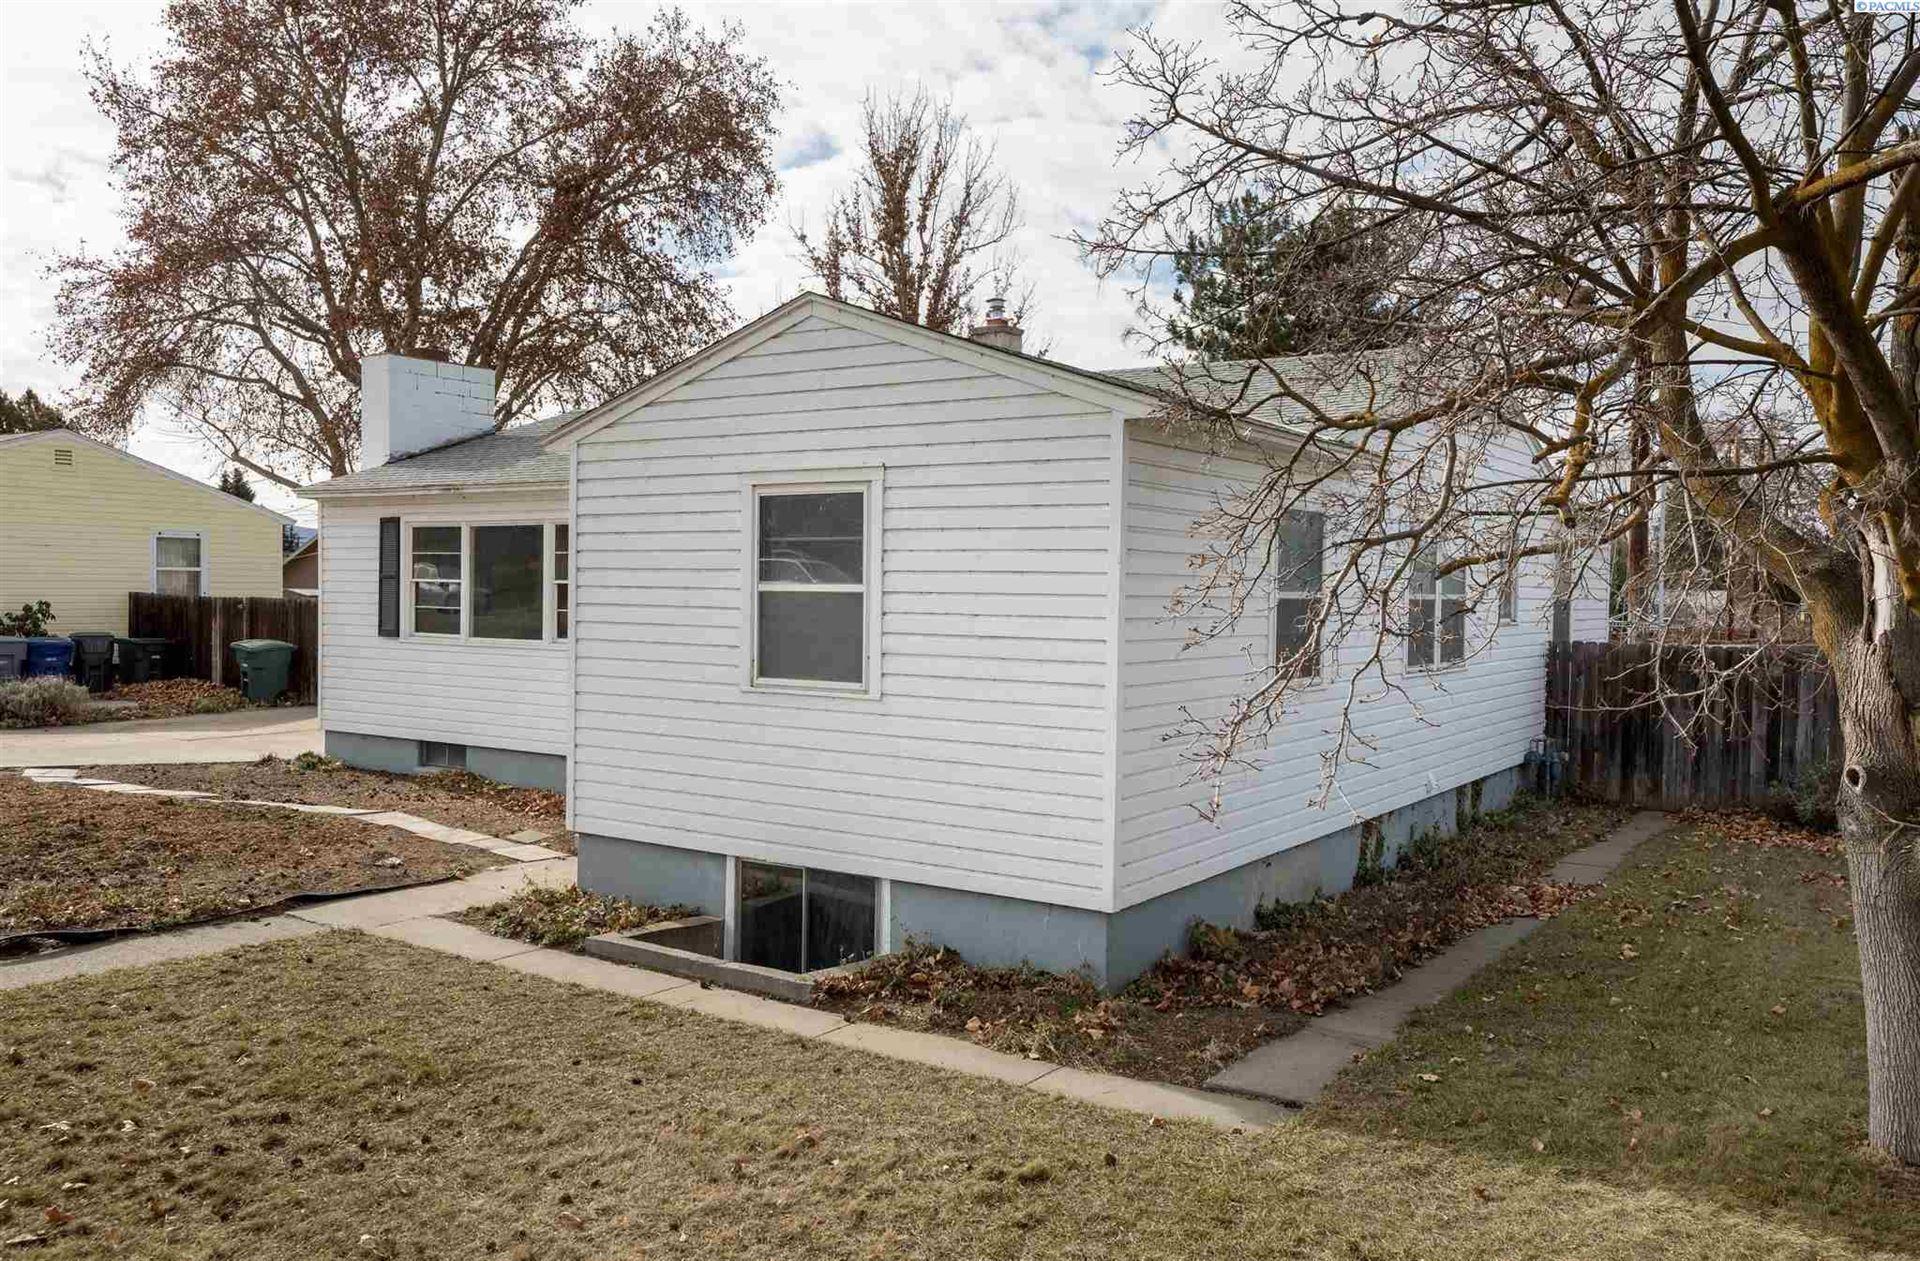 Photo of 1943 Davison Ave, Richland, WA 99354 (MLS # 251575)